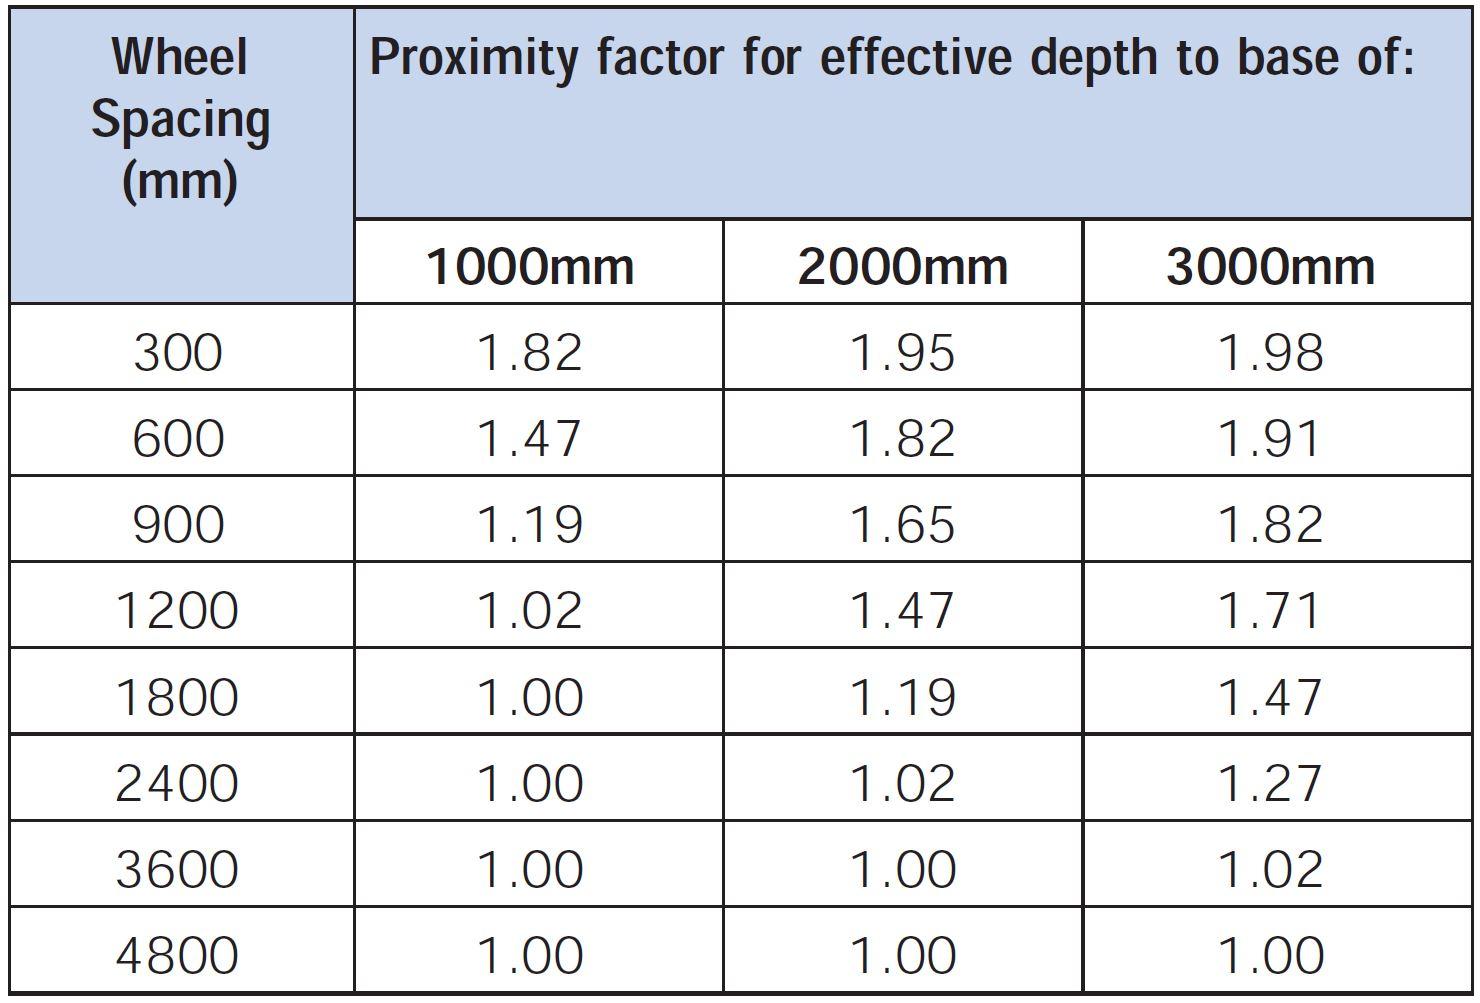 Heavy Duty Pavement Design - Proximity Factor Table